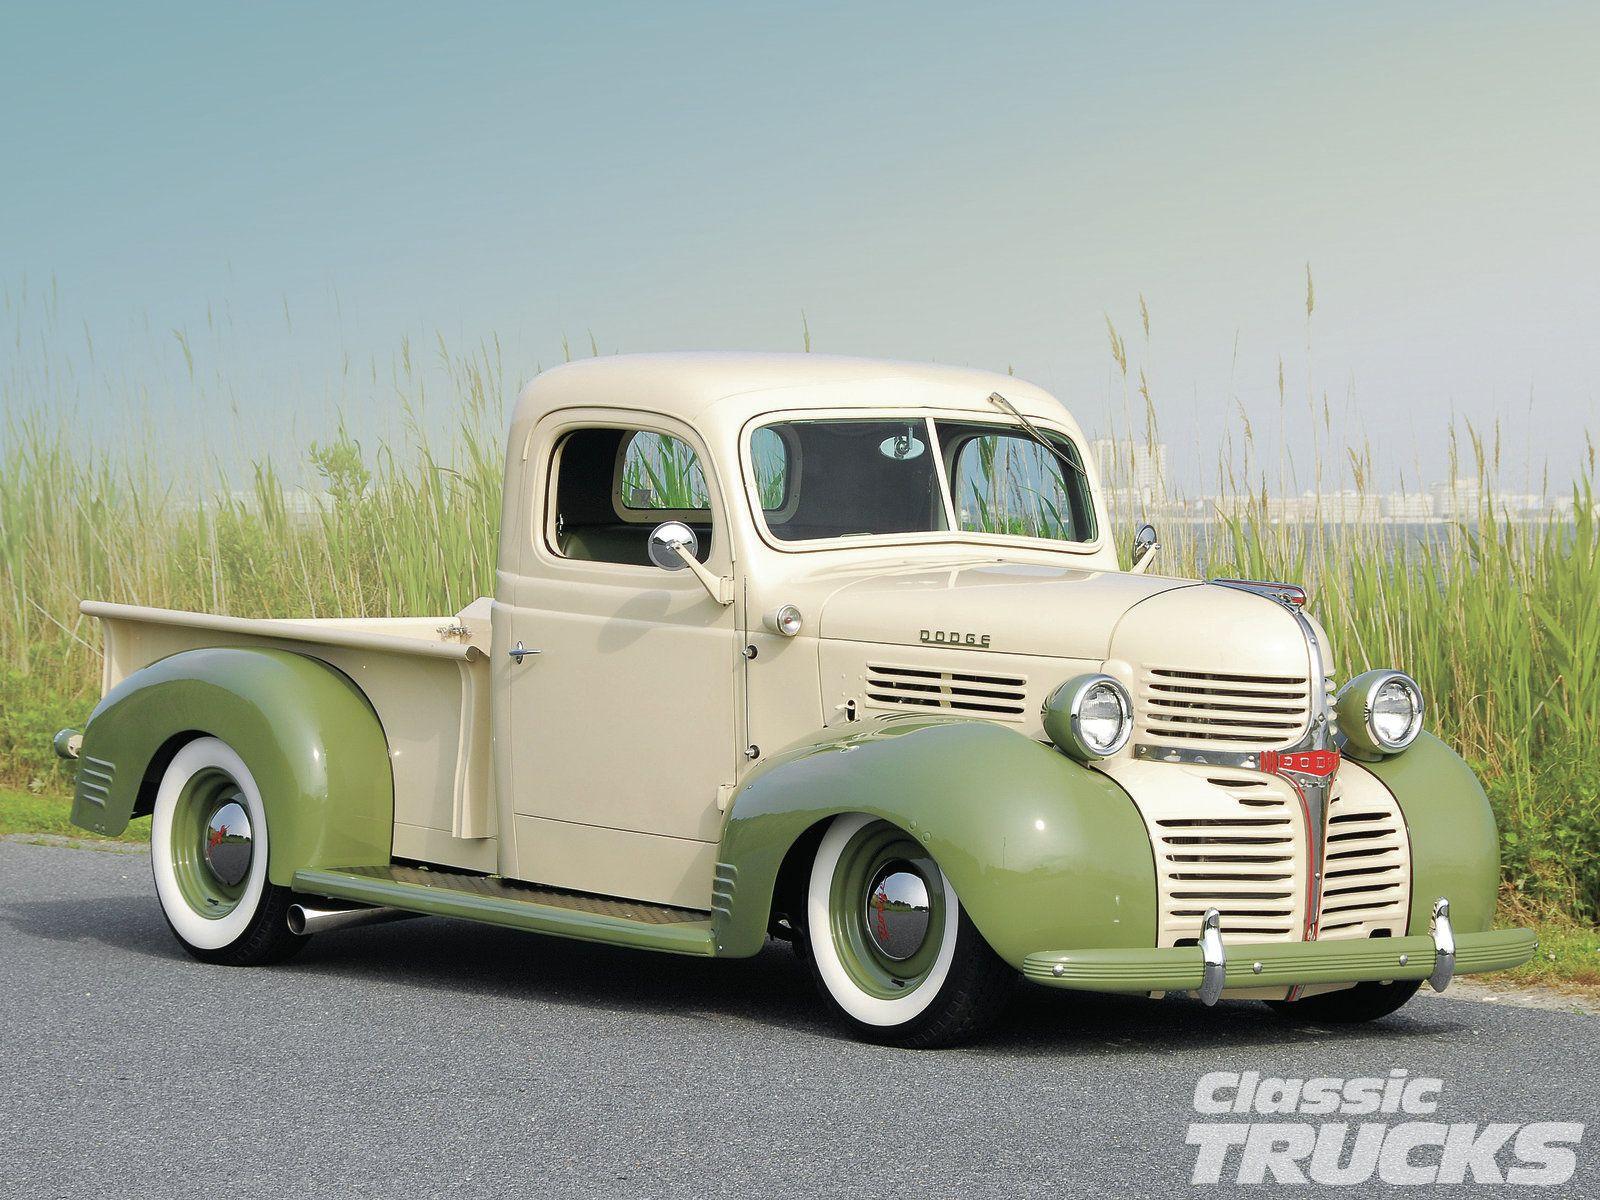 Pin by Benji Jackson on Dodge project | Pinterest | Vintage trucks ...